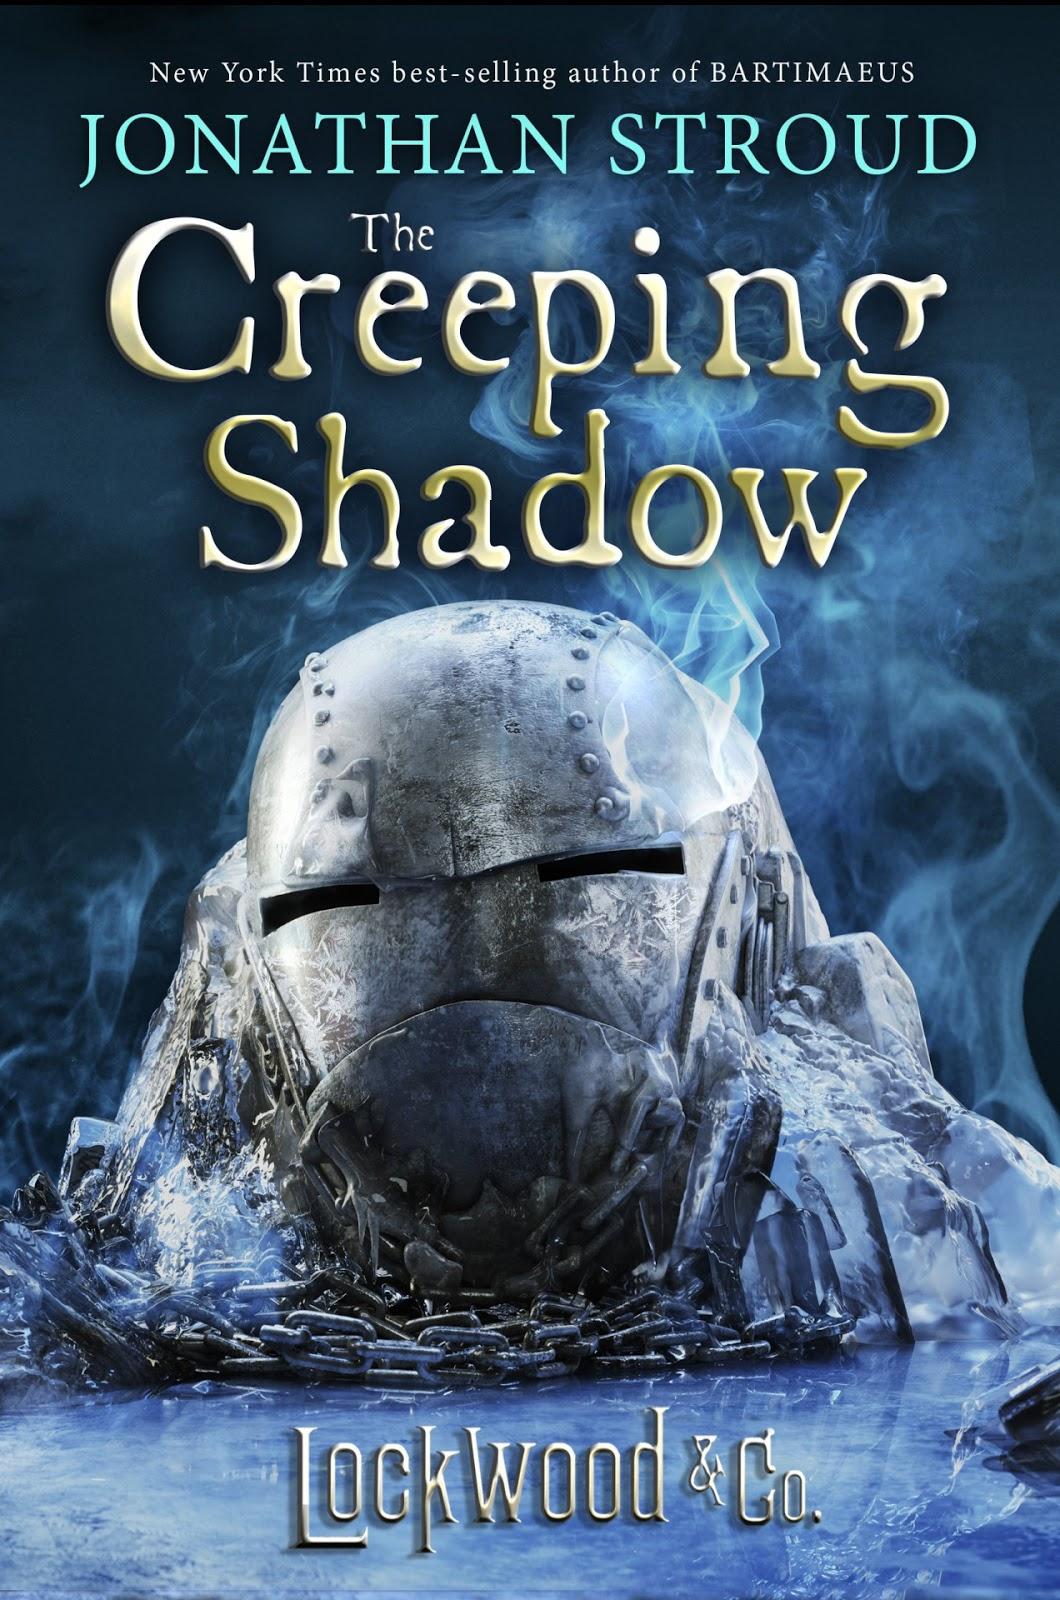 Lockwood & Company: The Creeping Shadow by Jonathan Stroud